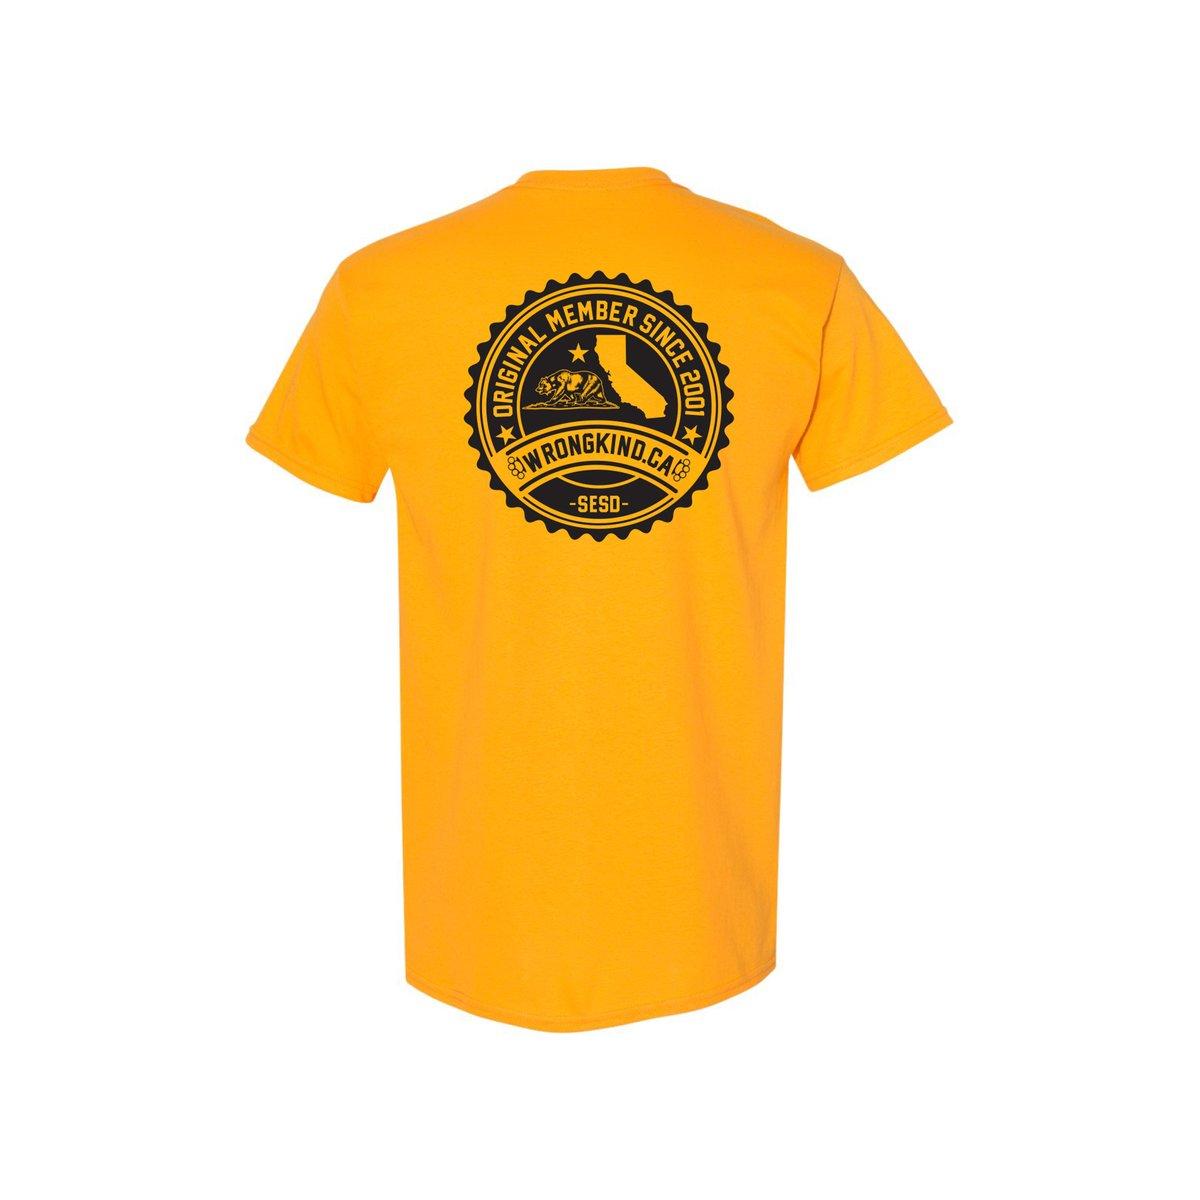 Image of Wrongkind Stamp T-Shirt (Gold w/ Black)